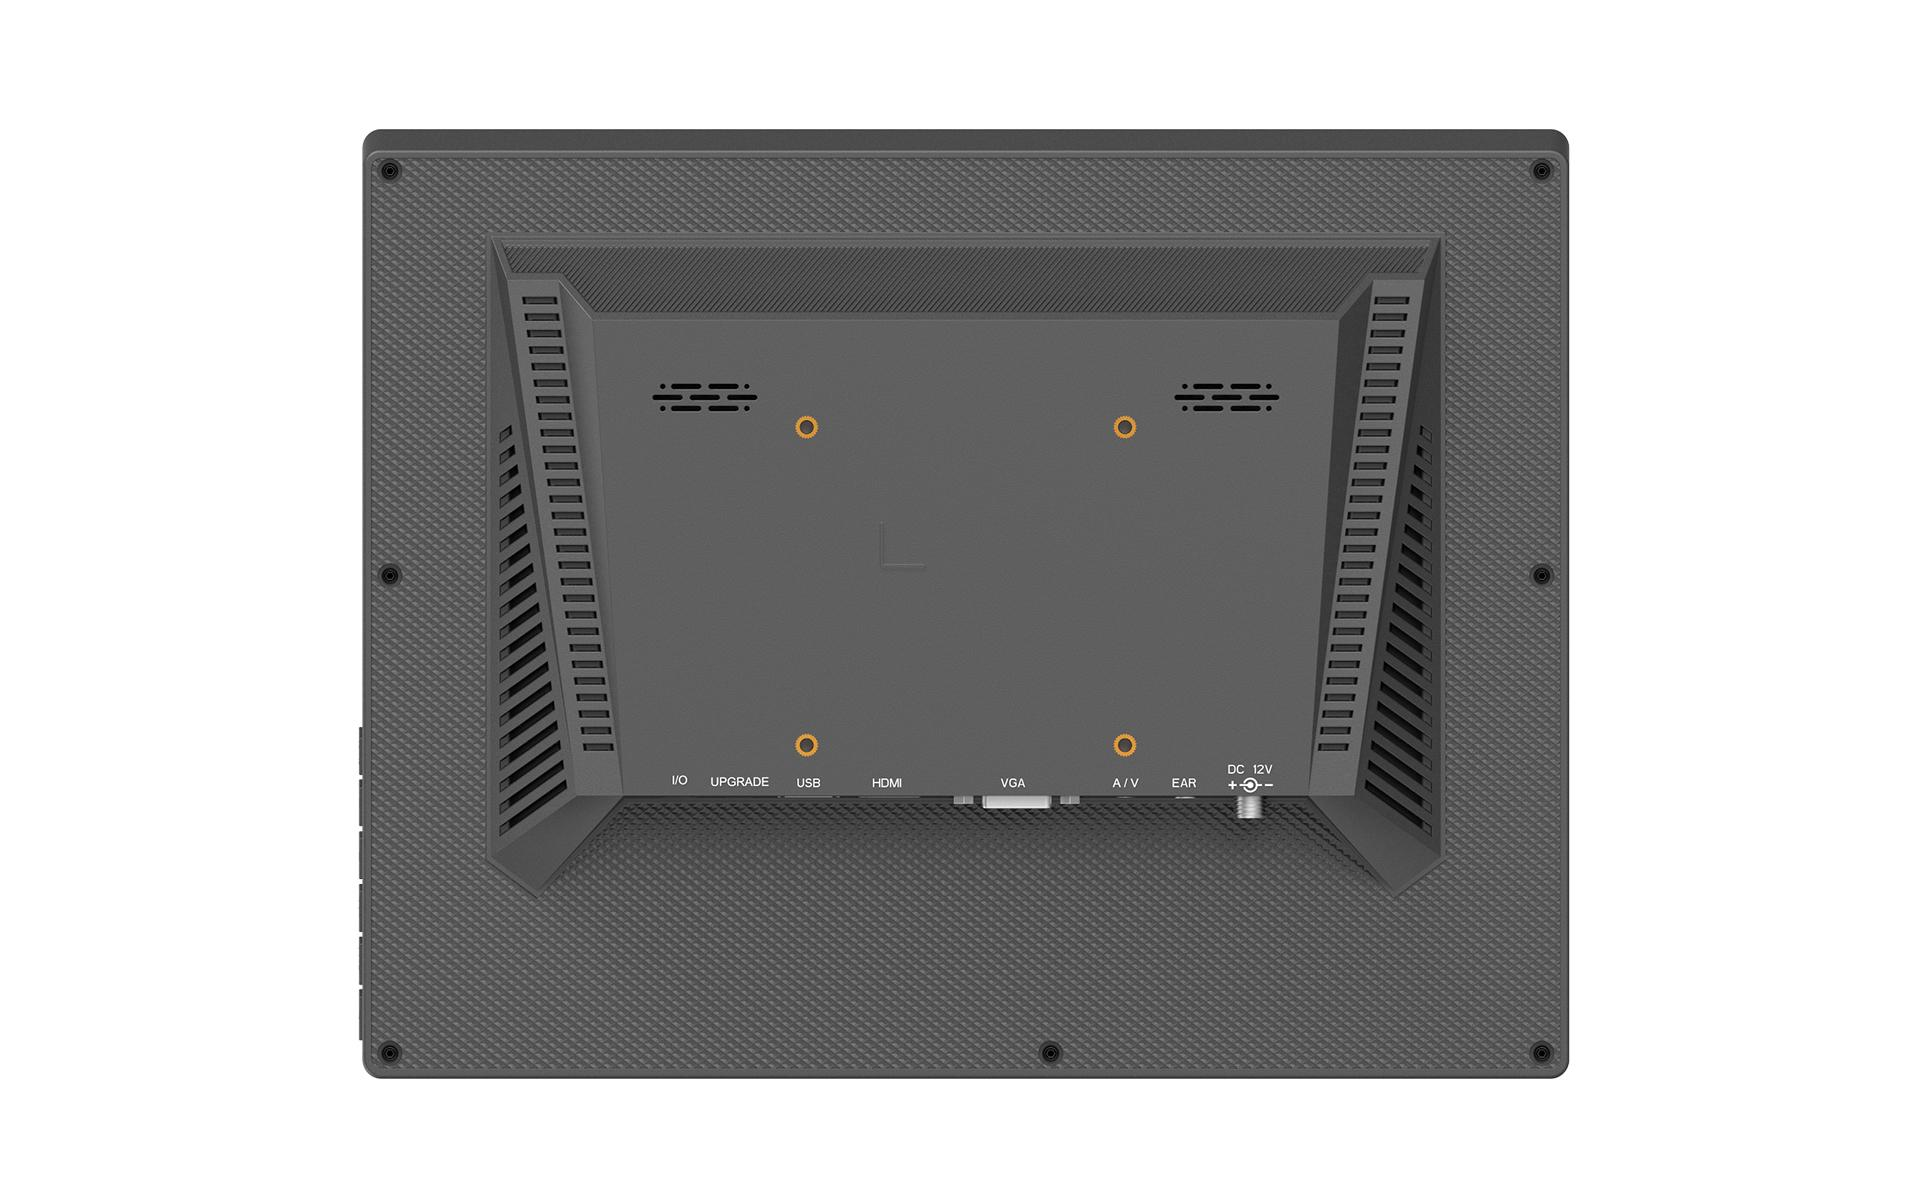 12 inch lcd monitor